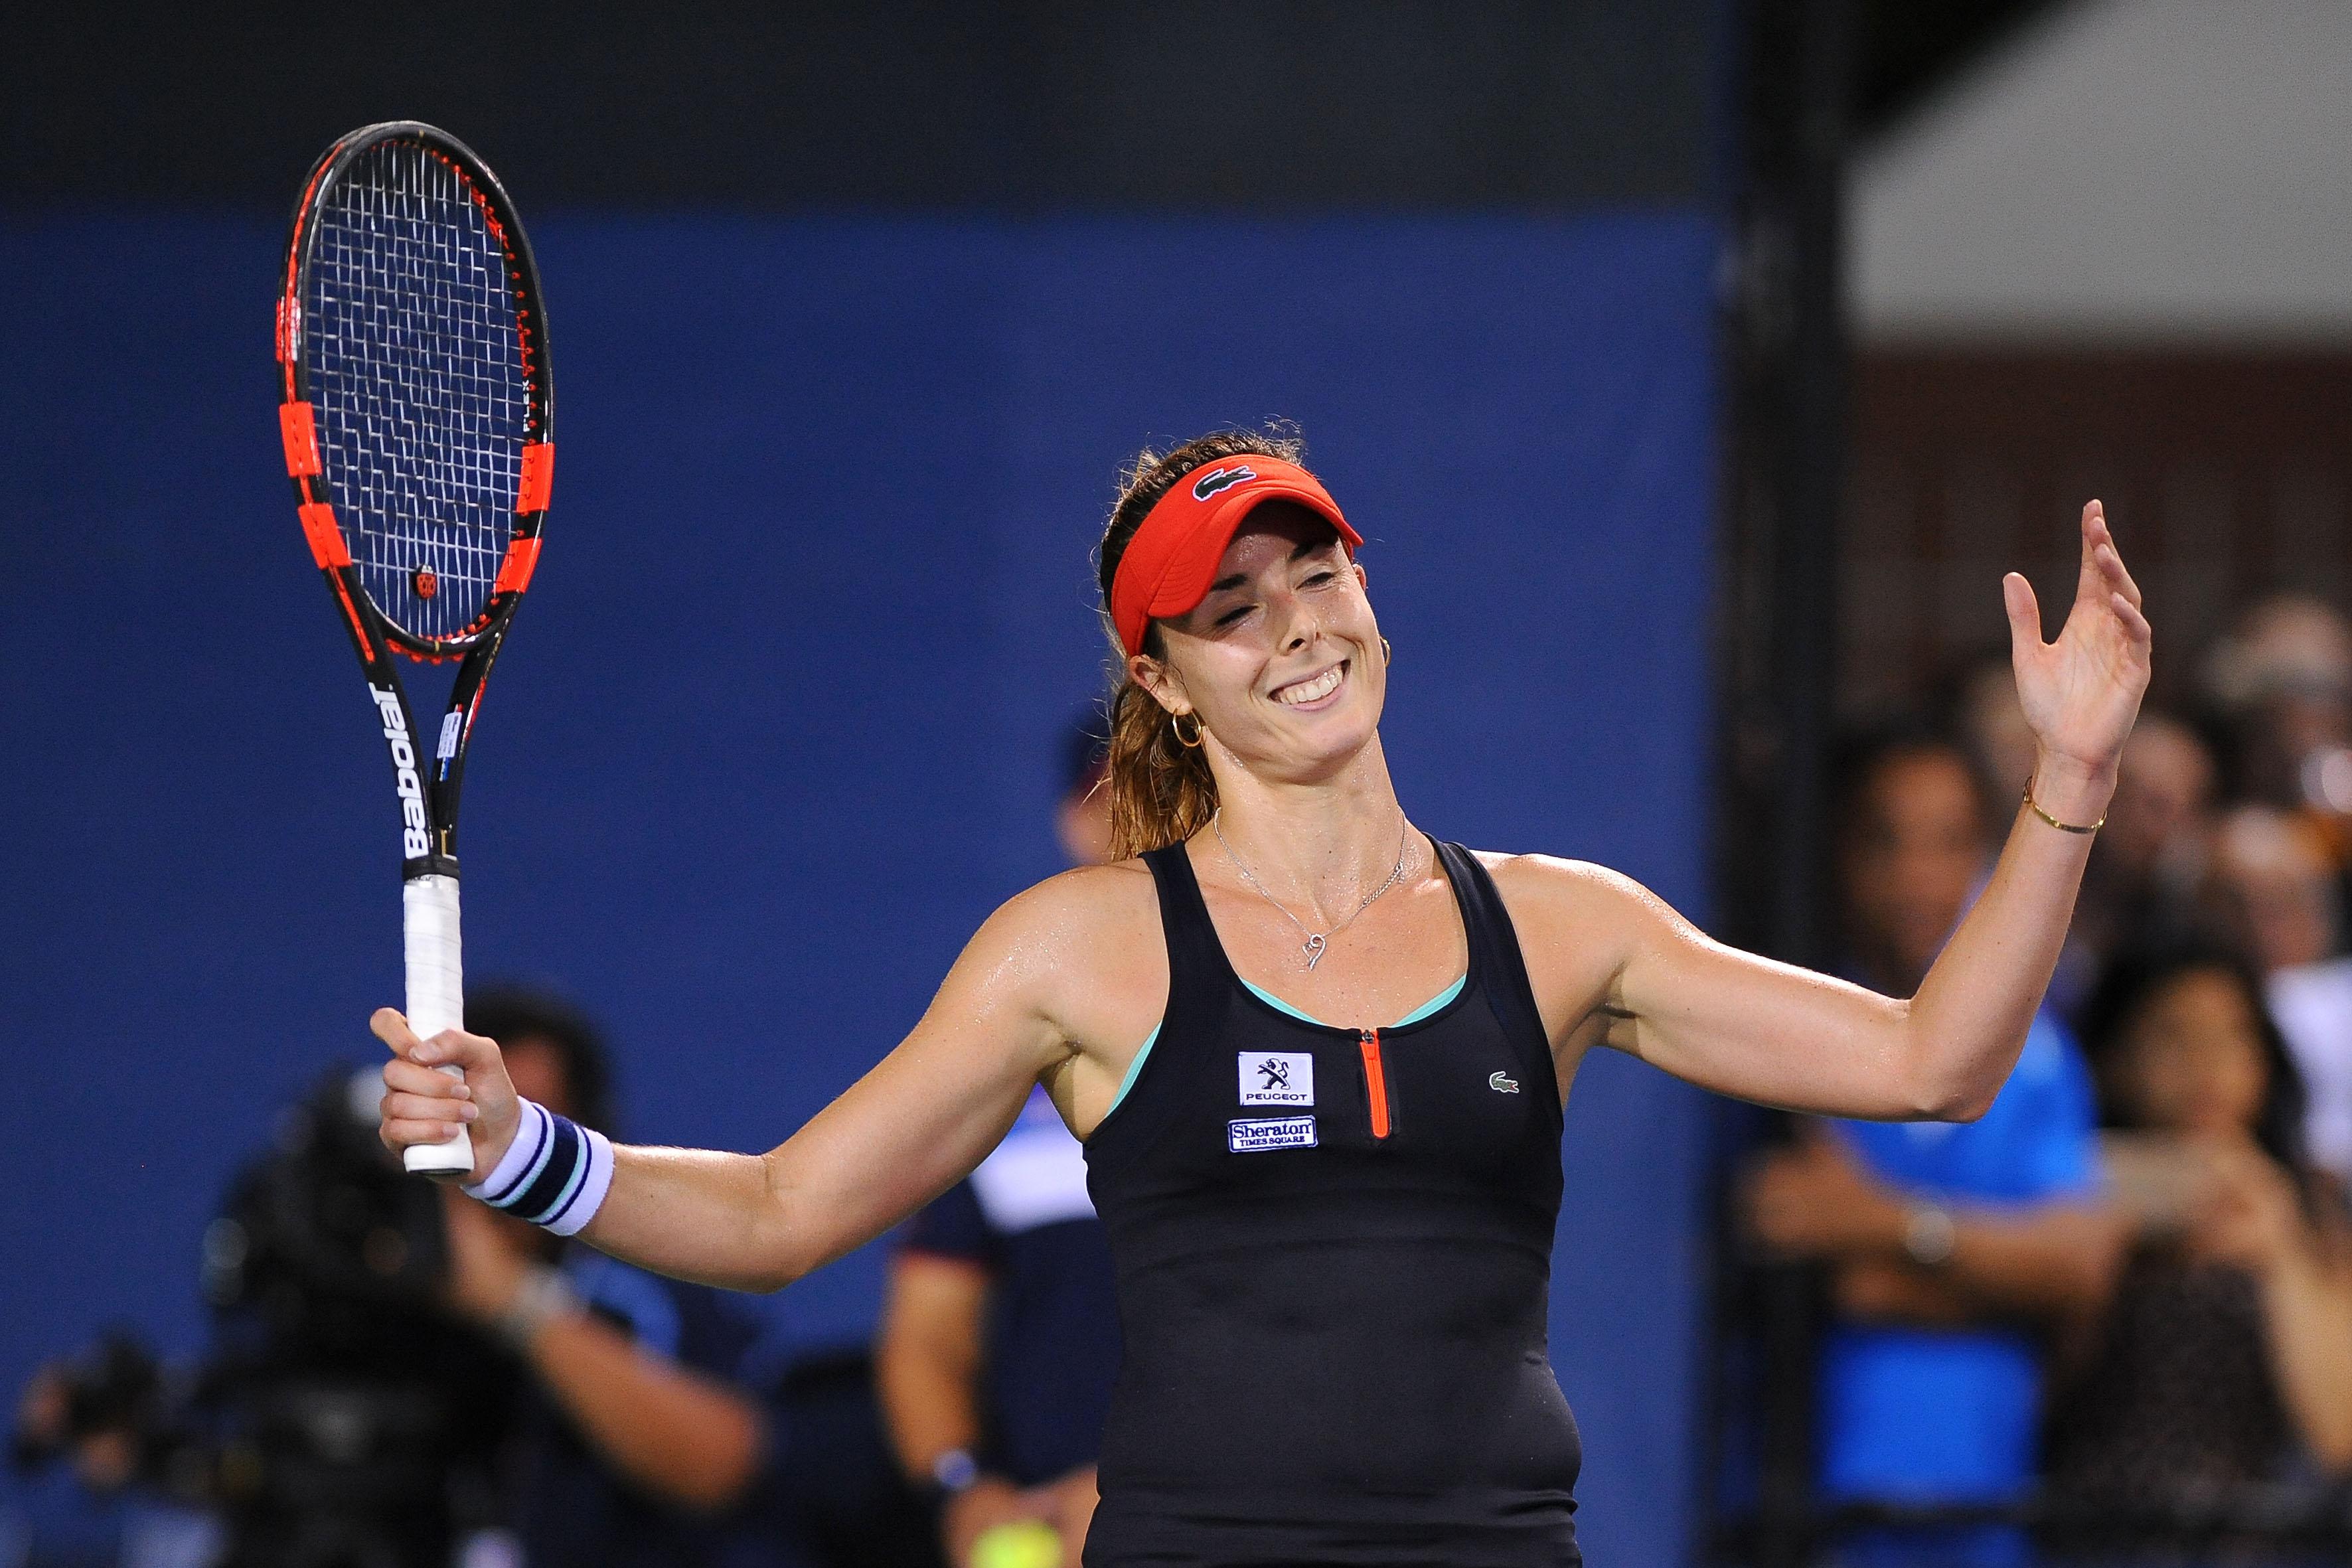 Tennis : WTA - </b>En &#233;crasant Bouchard, Cornet d&#233;bute magnifiquement 2016